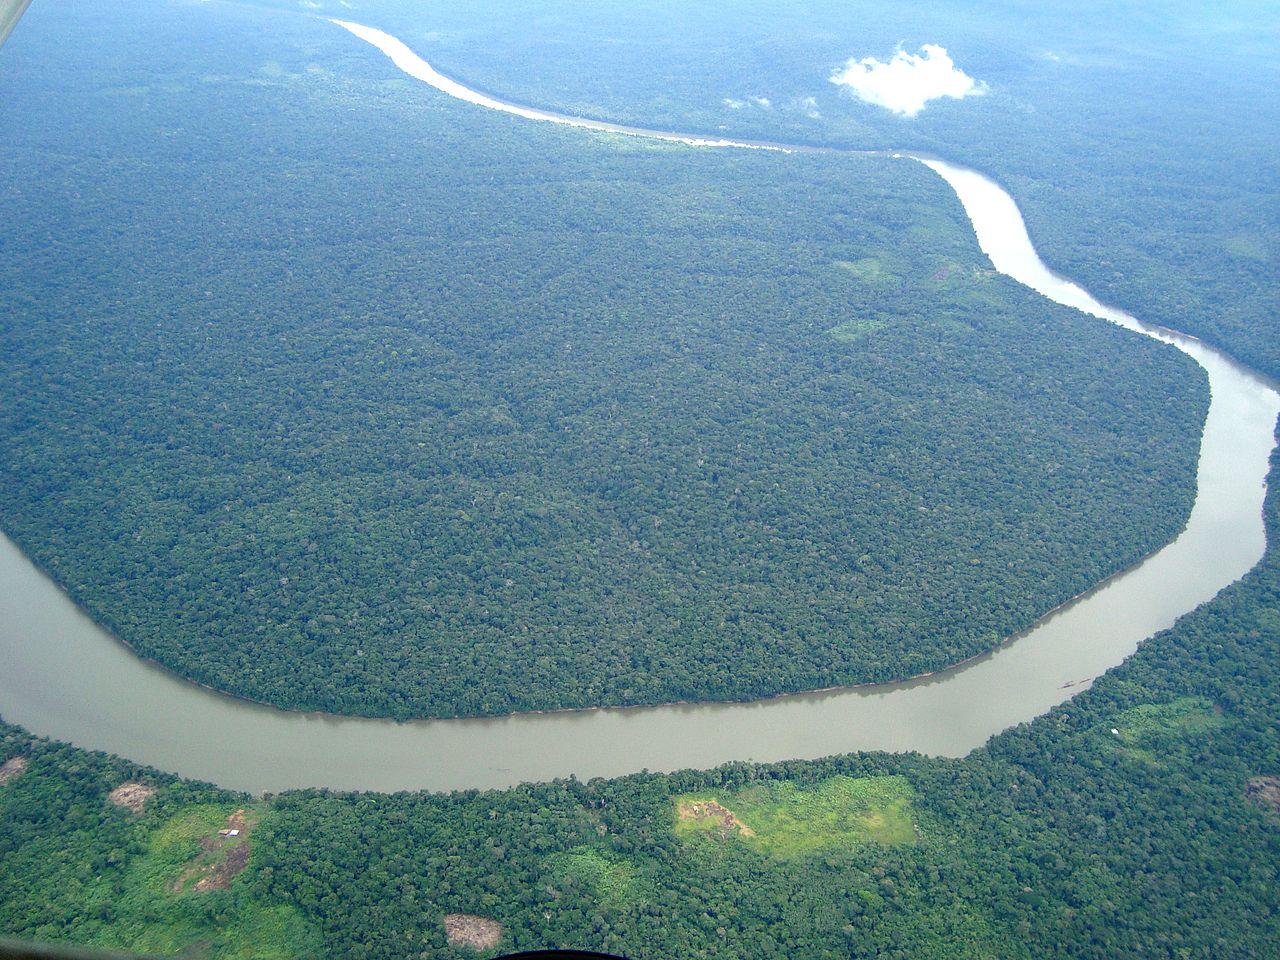 amazon rainforest south america - photo #35